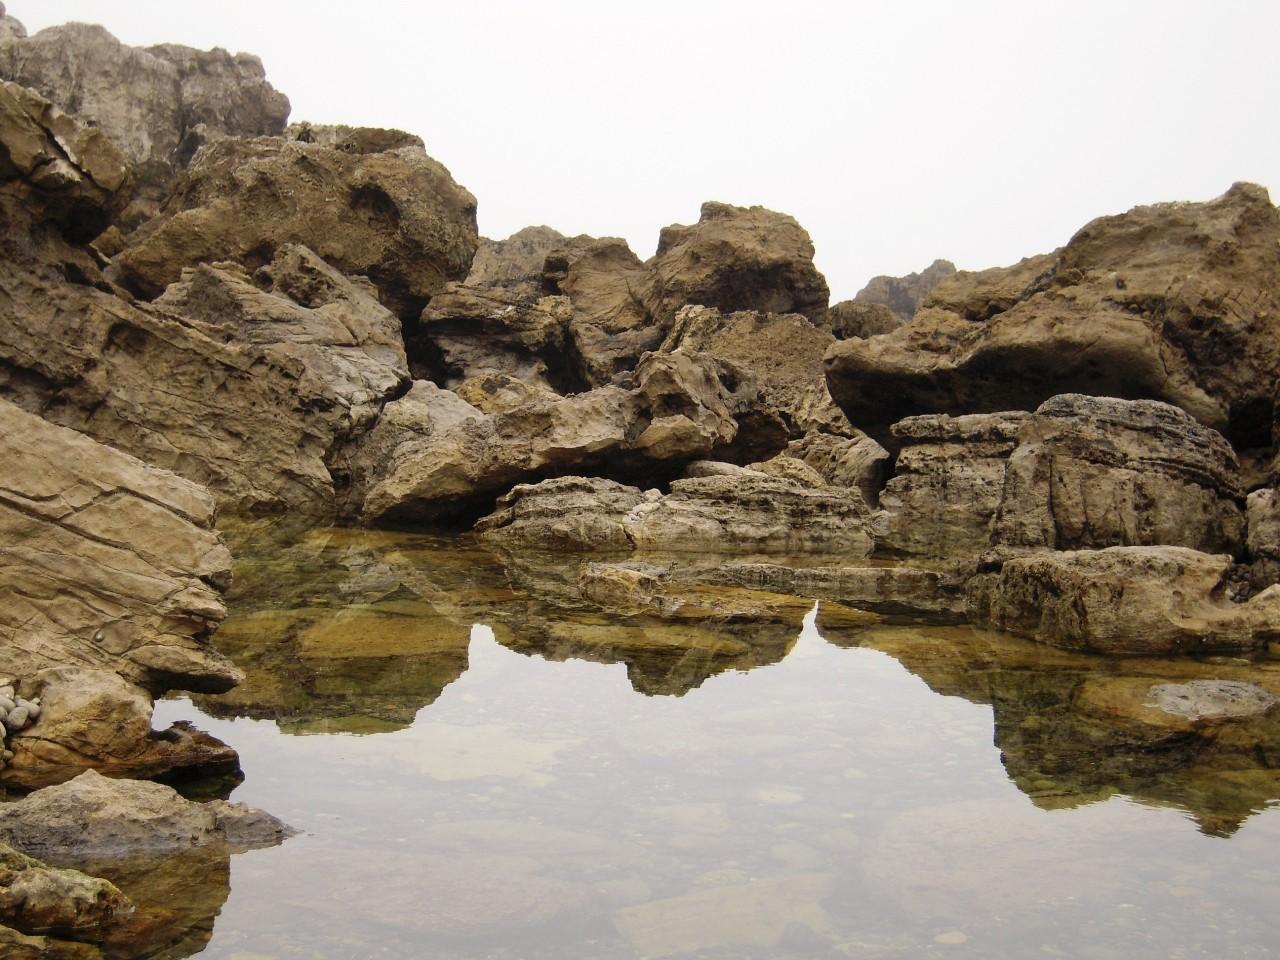 Playa Beciella / Barciella